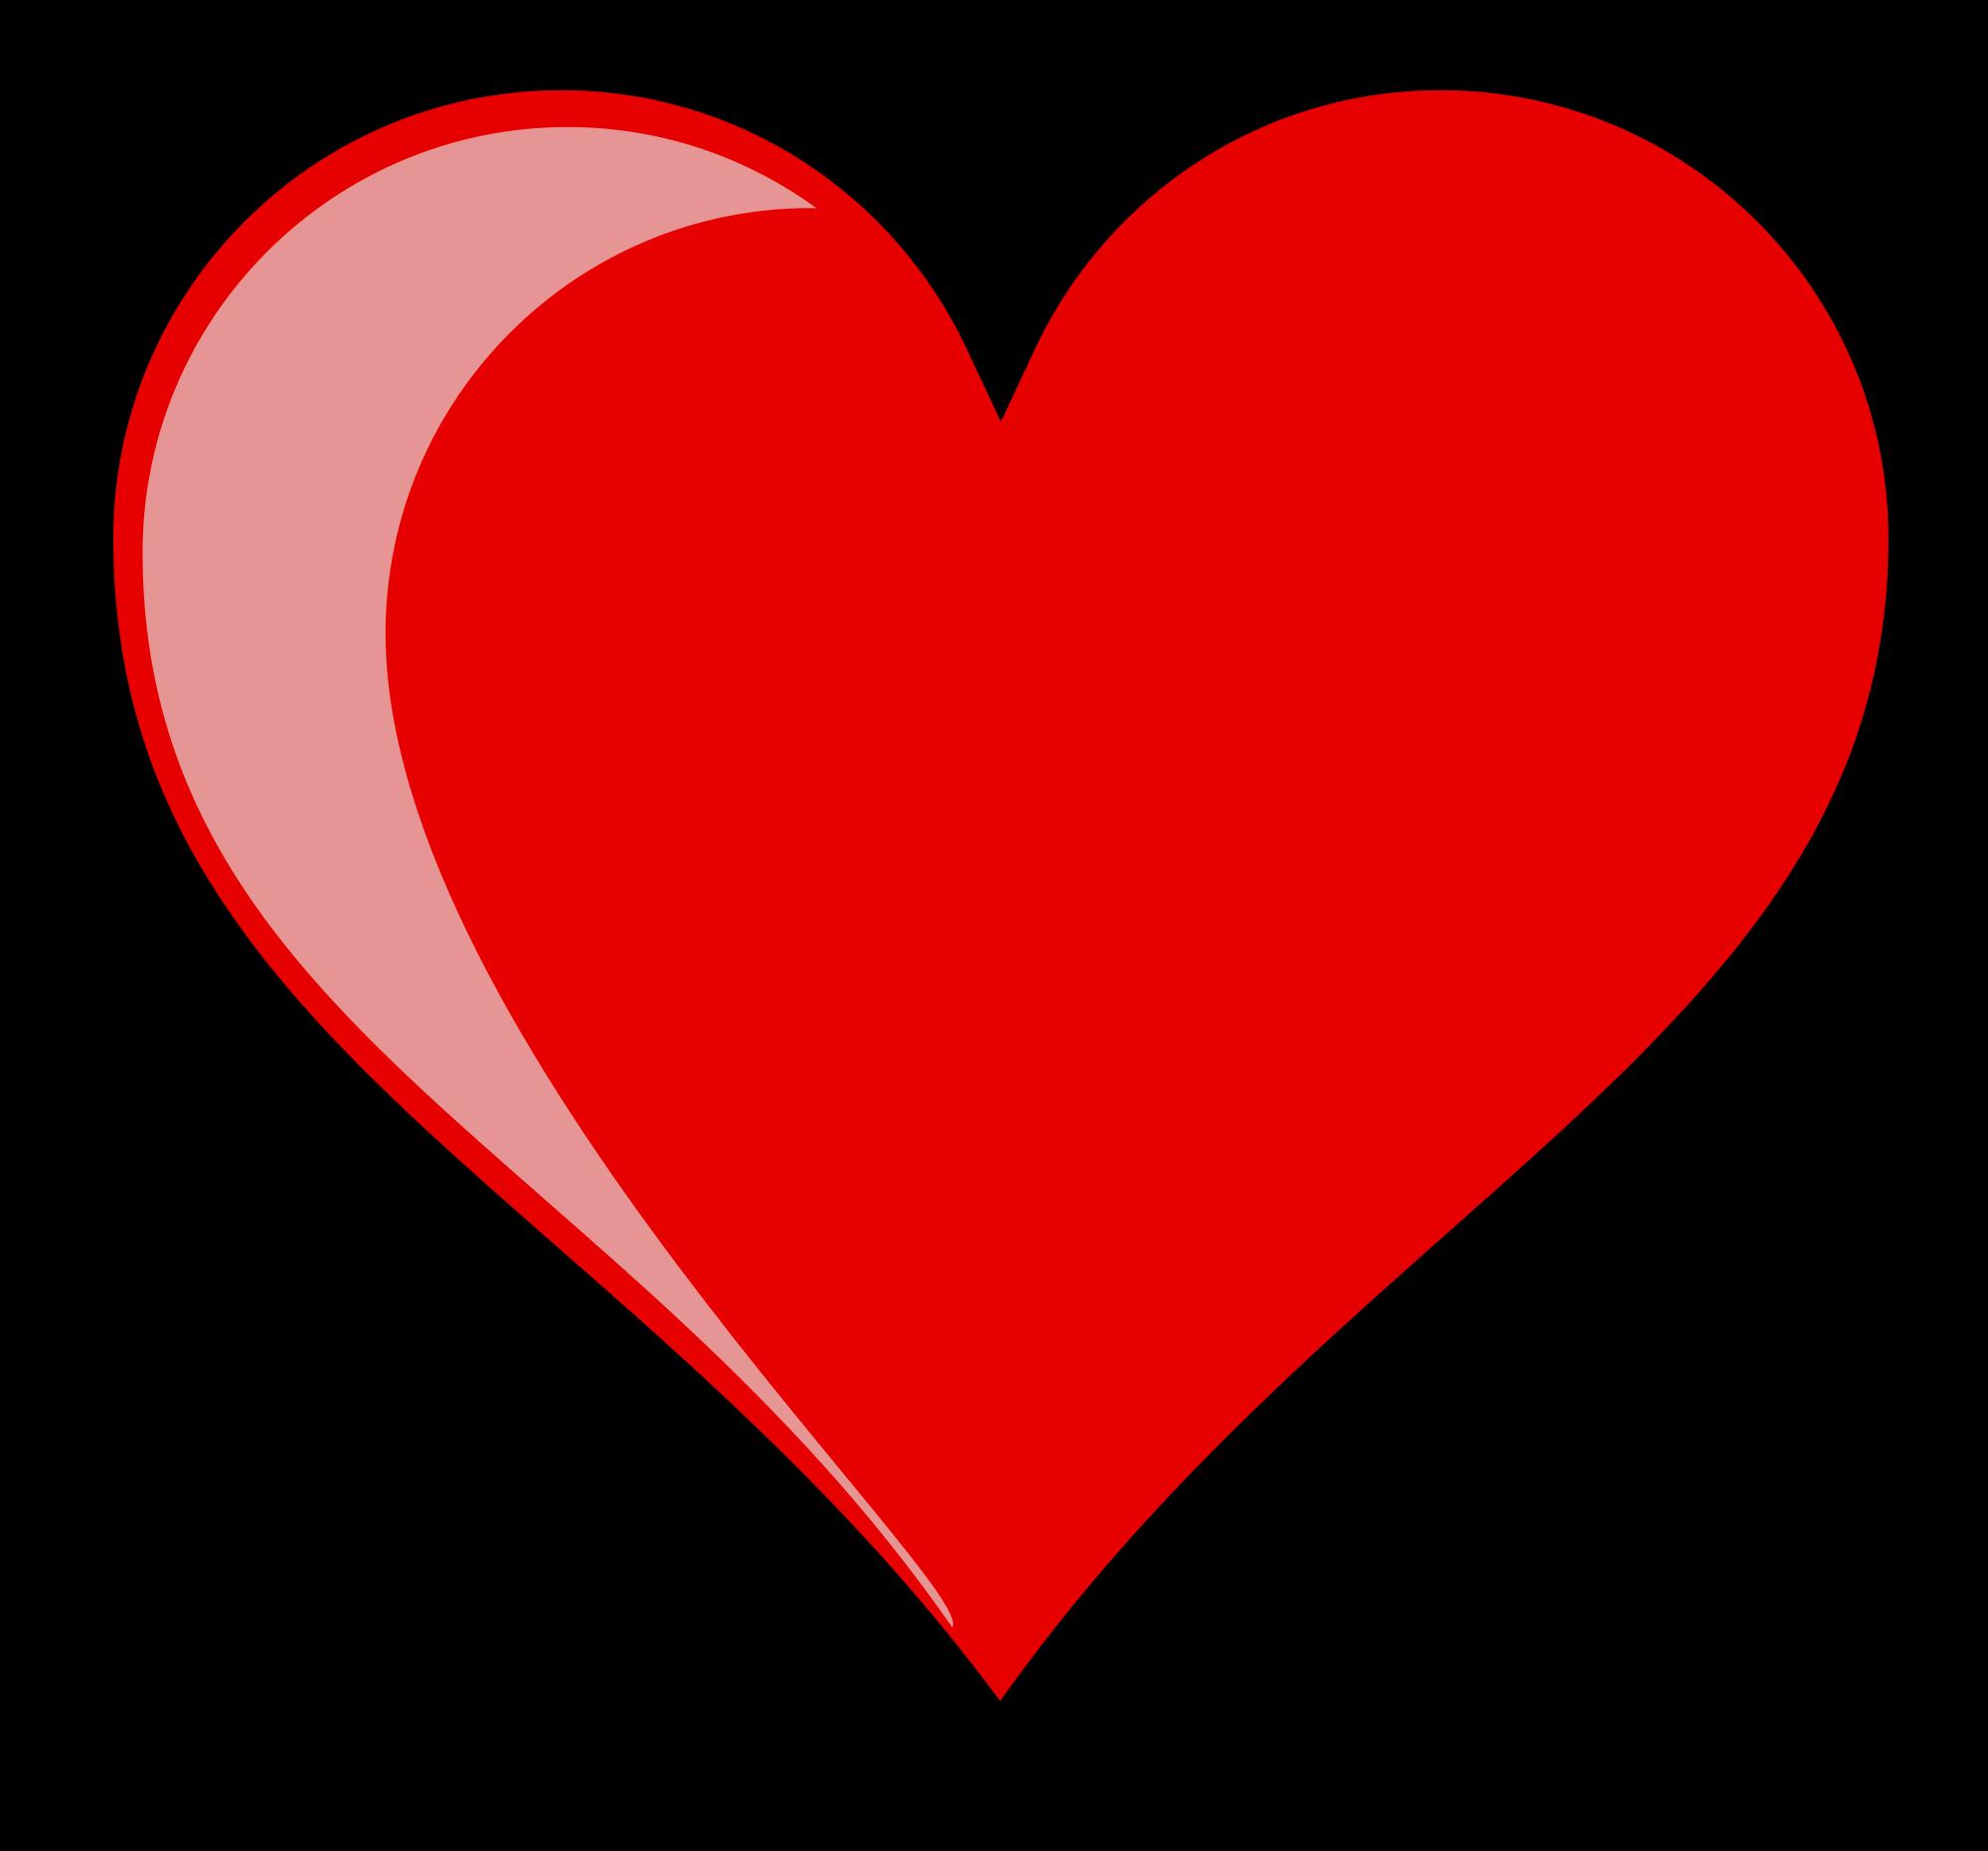 Public domain heart clipart clip art free download File:Heart left-highlight jon 01.svg - Wikimedia Commons clip art free download